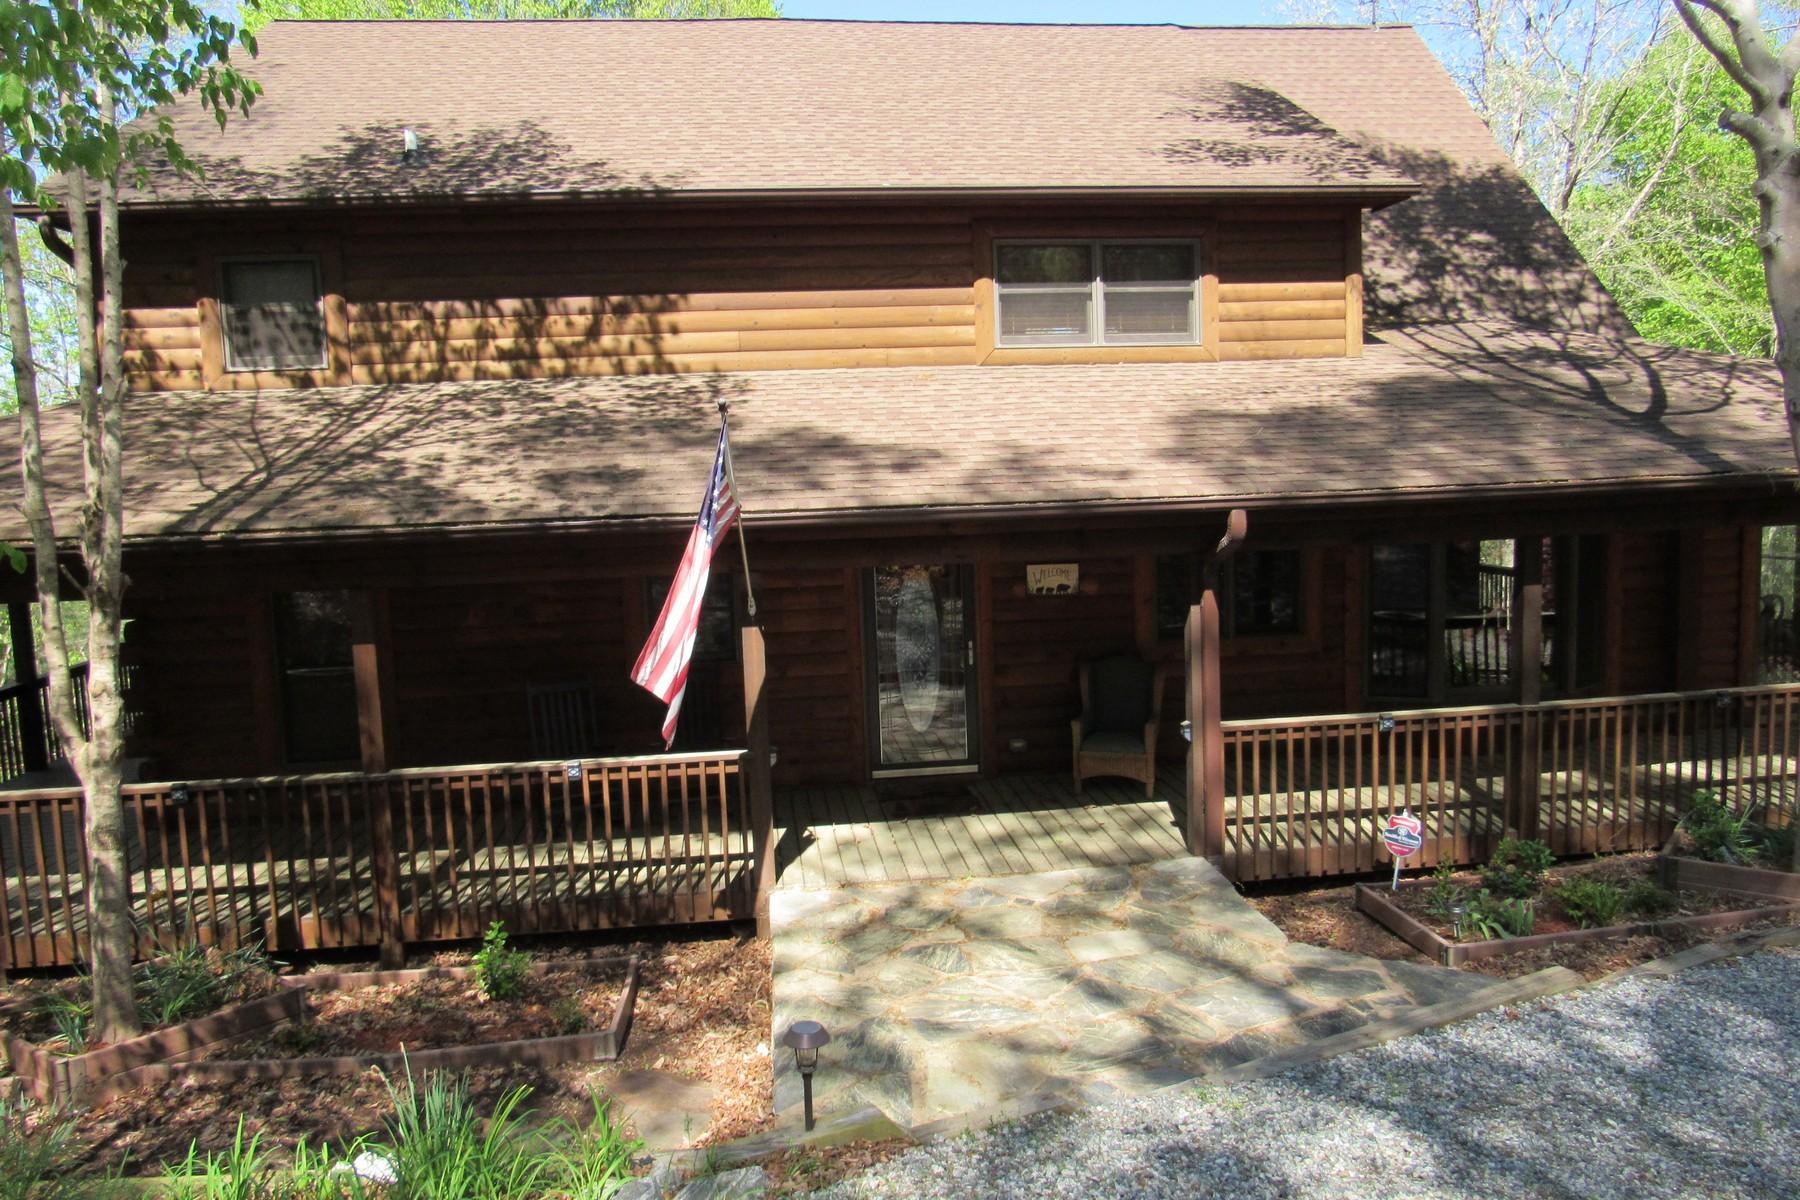 Single Family Home for Active at 156 Sassafras Ridge, Rutherfordton, NC 28139-7074 156 Sassafras Ridge Rutherfordton, North Carolina 28139 United States